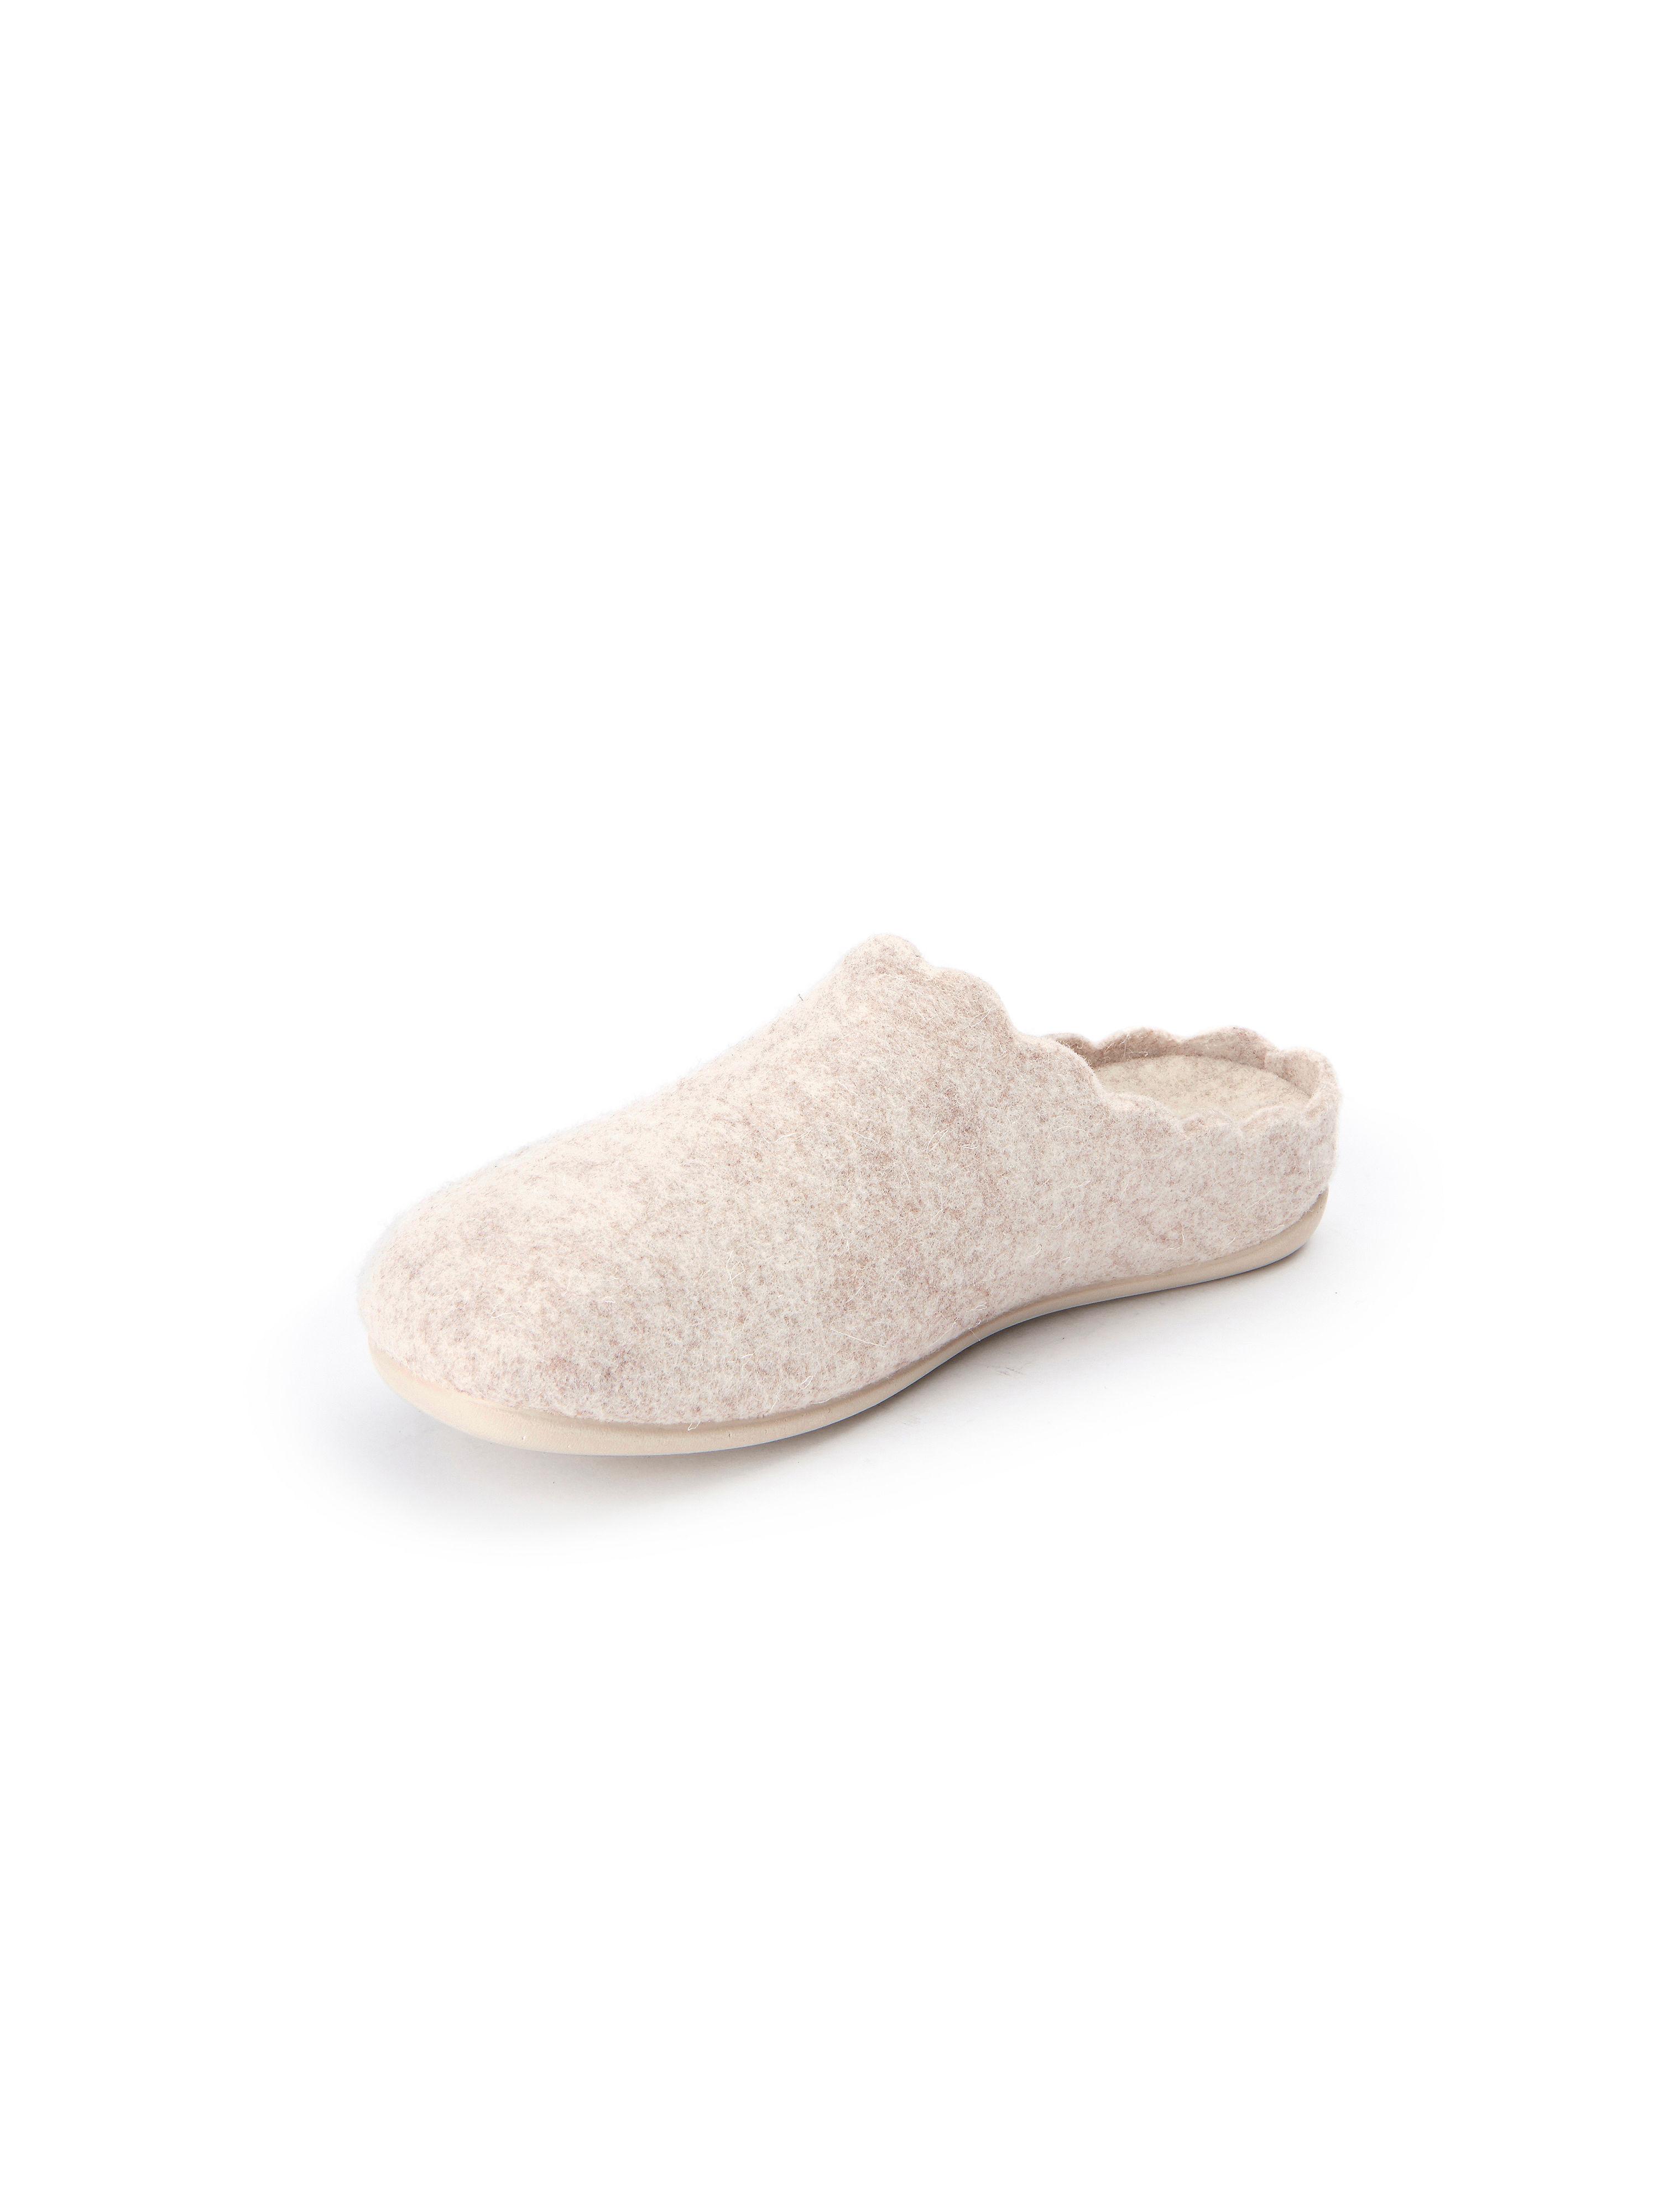 Pantoffels Van Shepherd beige